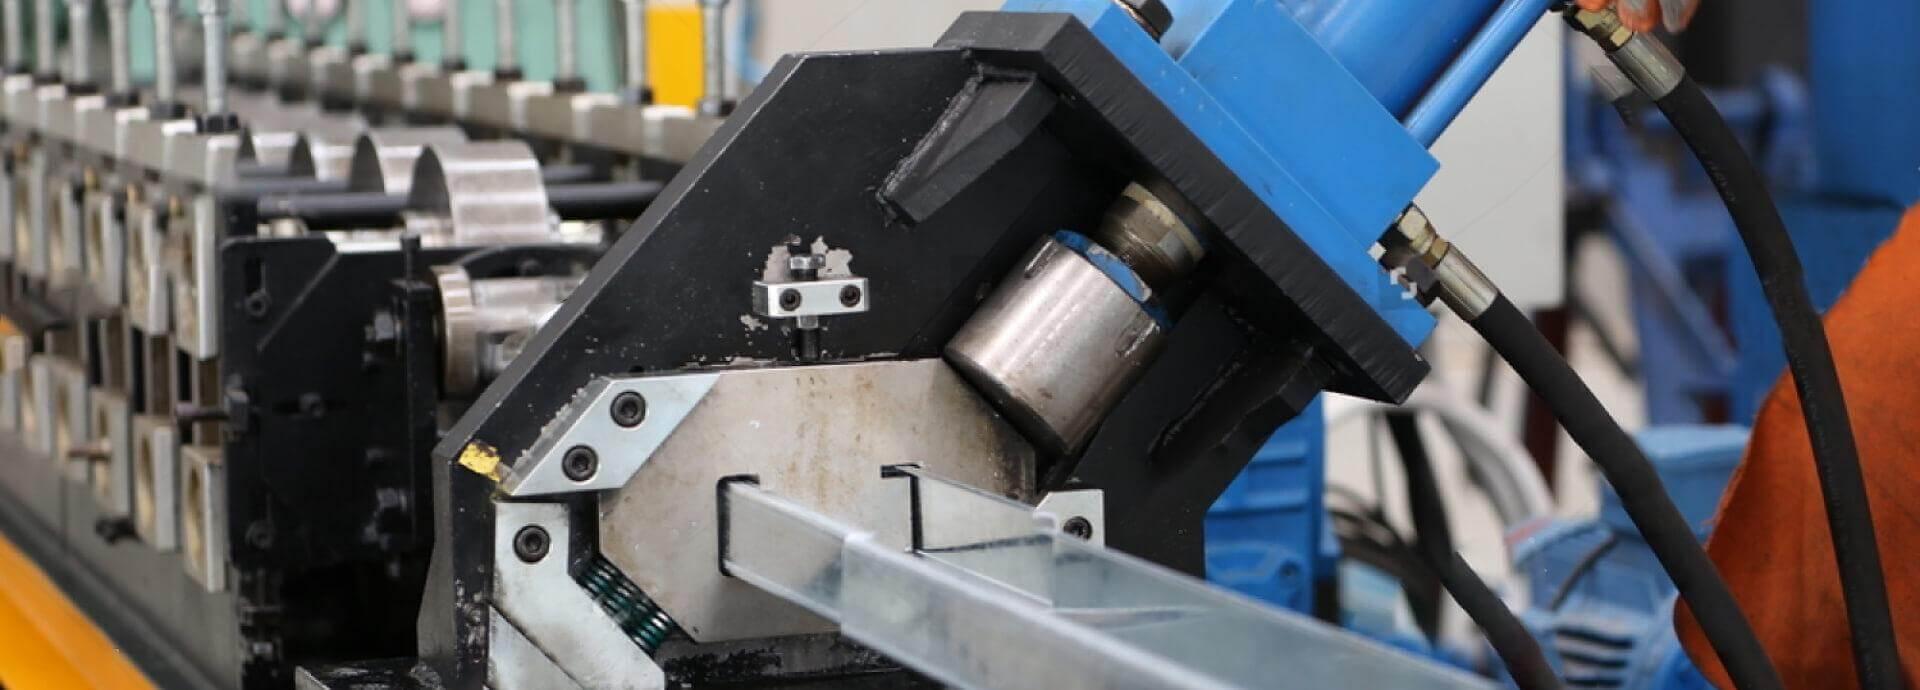 Производство и монтпаж металлоконструкций от компании CKS